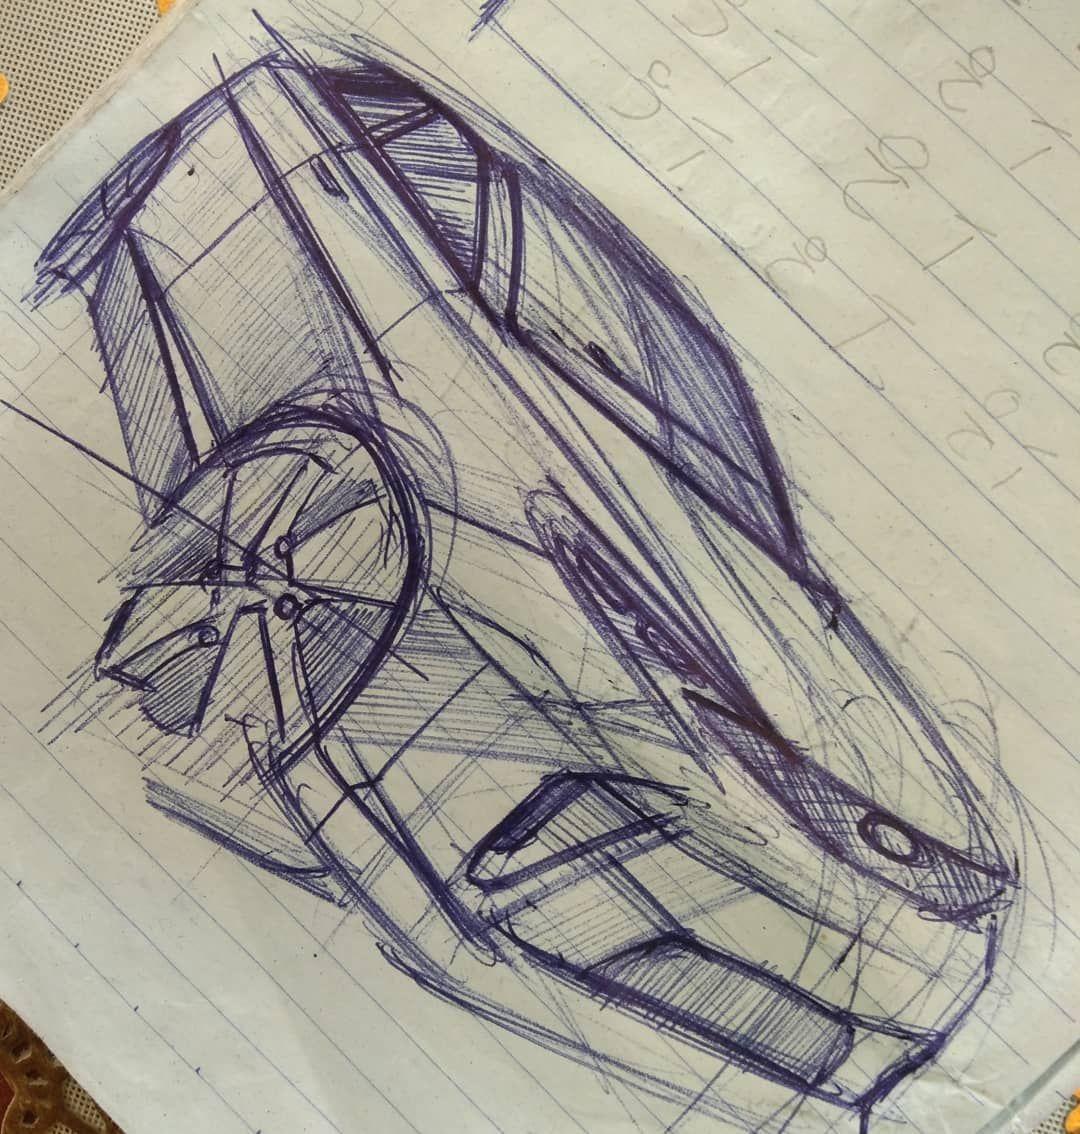 Sketsa kilat dibuku tulis #cardesign #car #design #carsketch #sketch #ferrari #laferrari #hypercar #supercar #transportation #art #design #car #travel #artist #cars #artwork #designer #love #vehicle #drawing #interiordesign #fitness #transportationdesign #instaart #designs #card #ferrarilaferrari